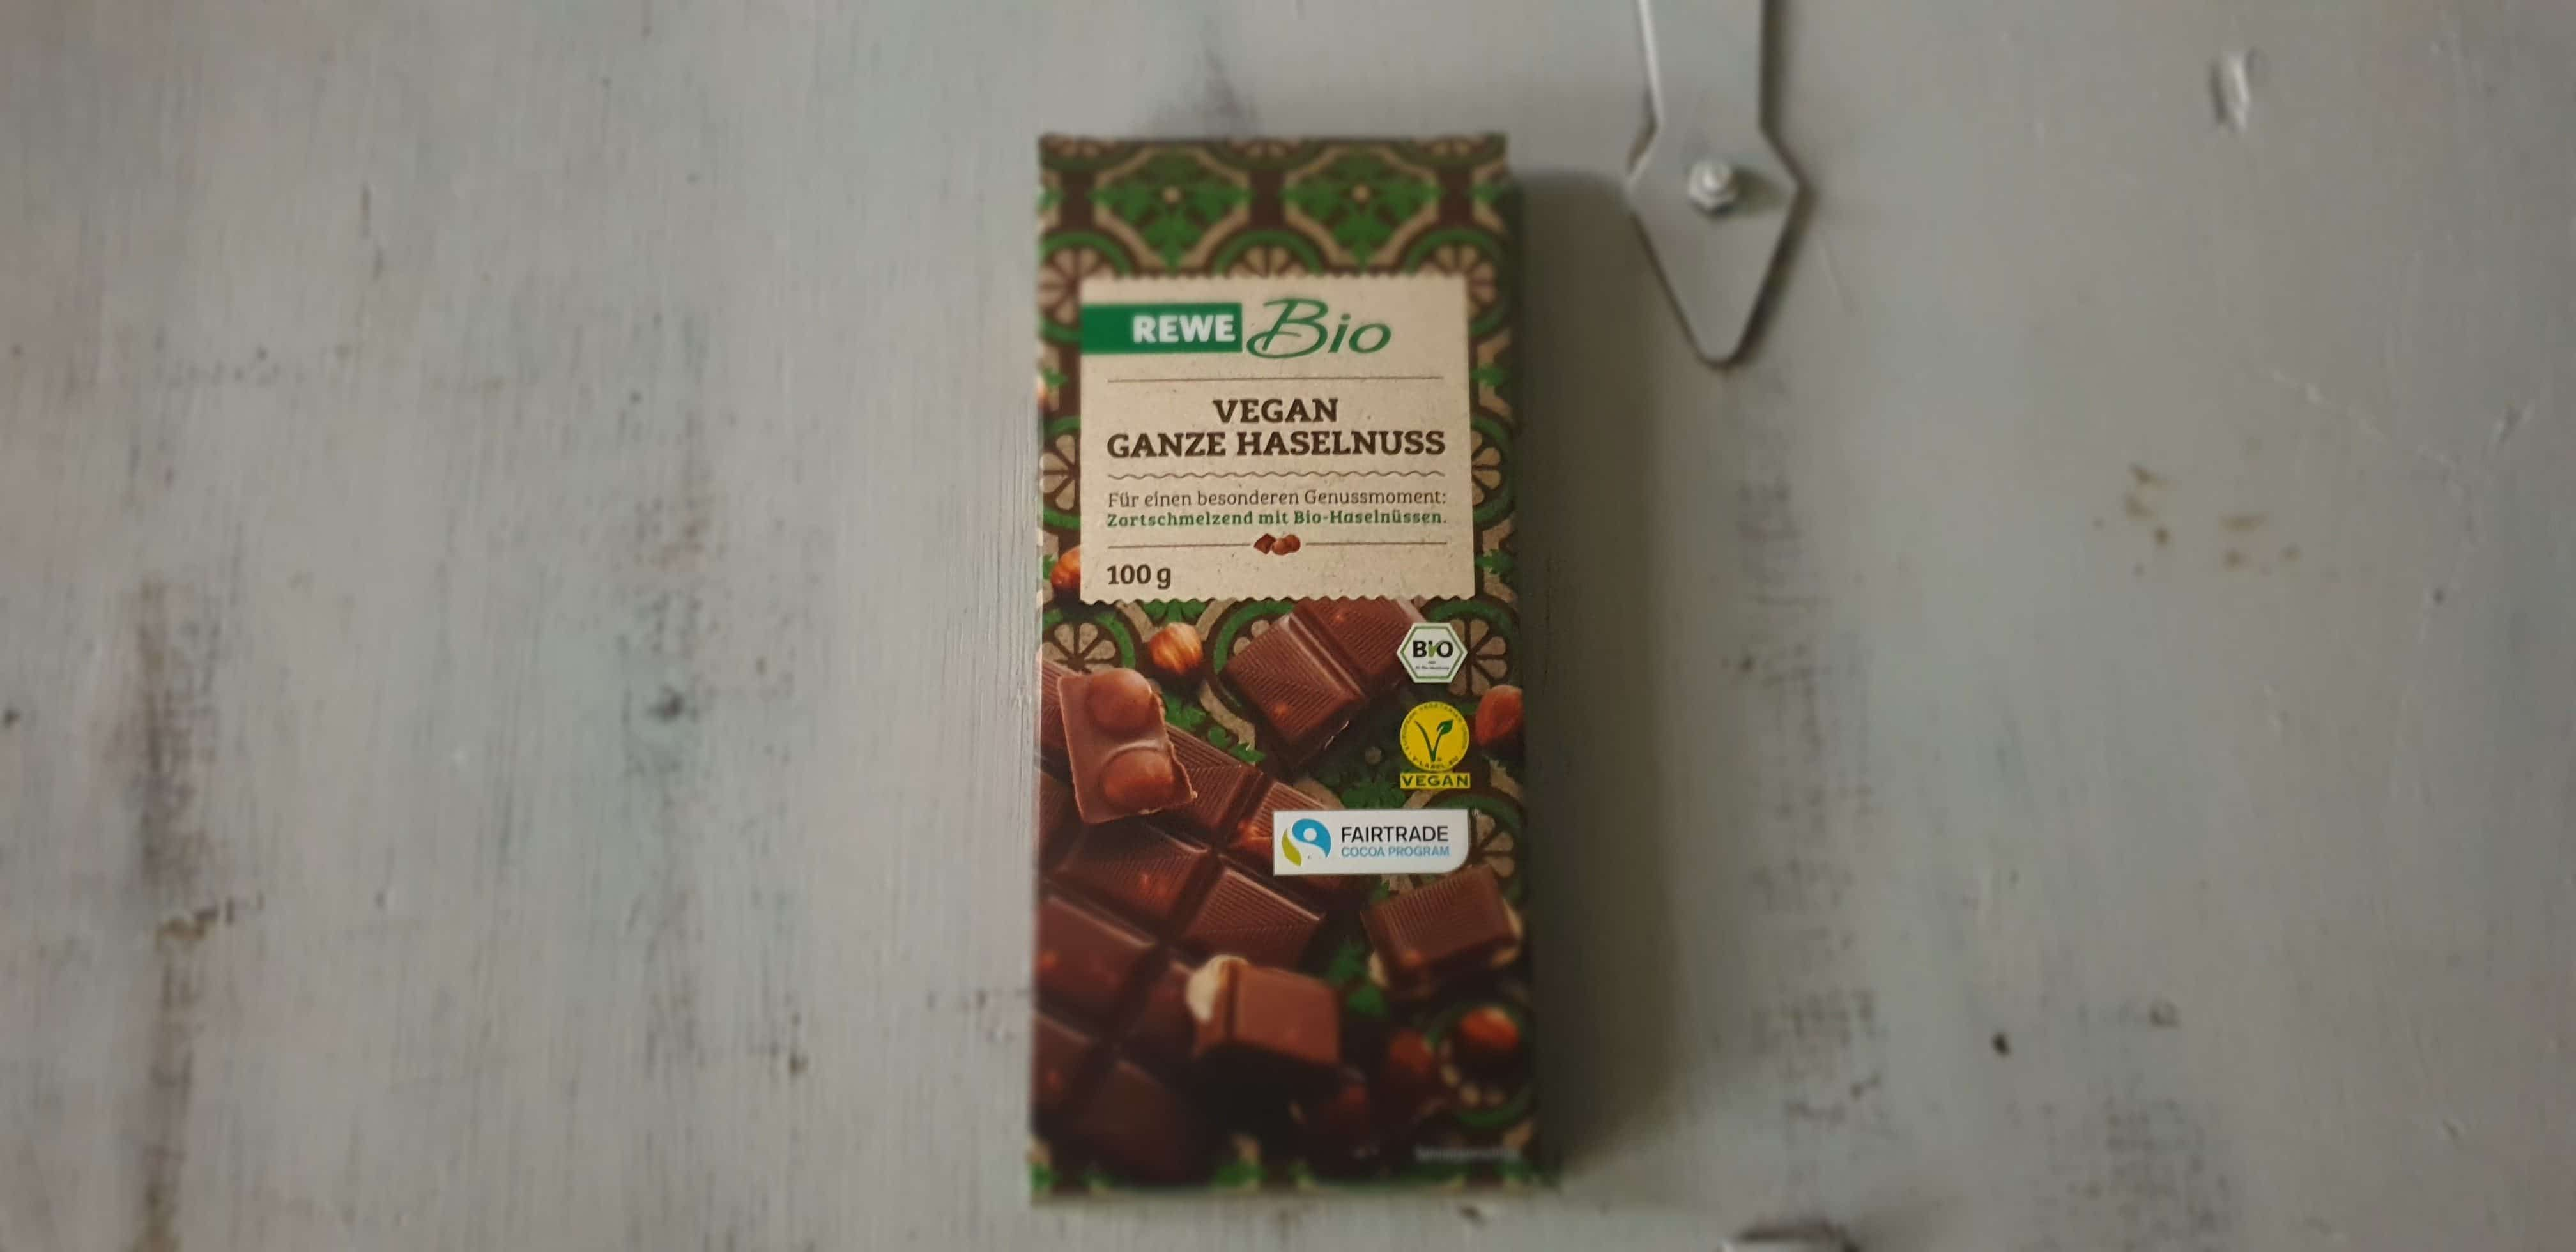 Leckere Vegane Schokolade Ohne Milch Vegane Schokolade Bio